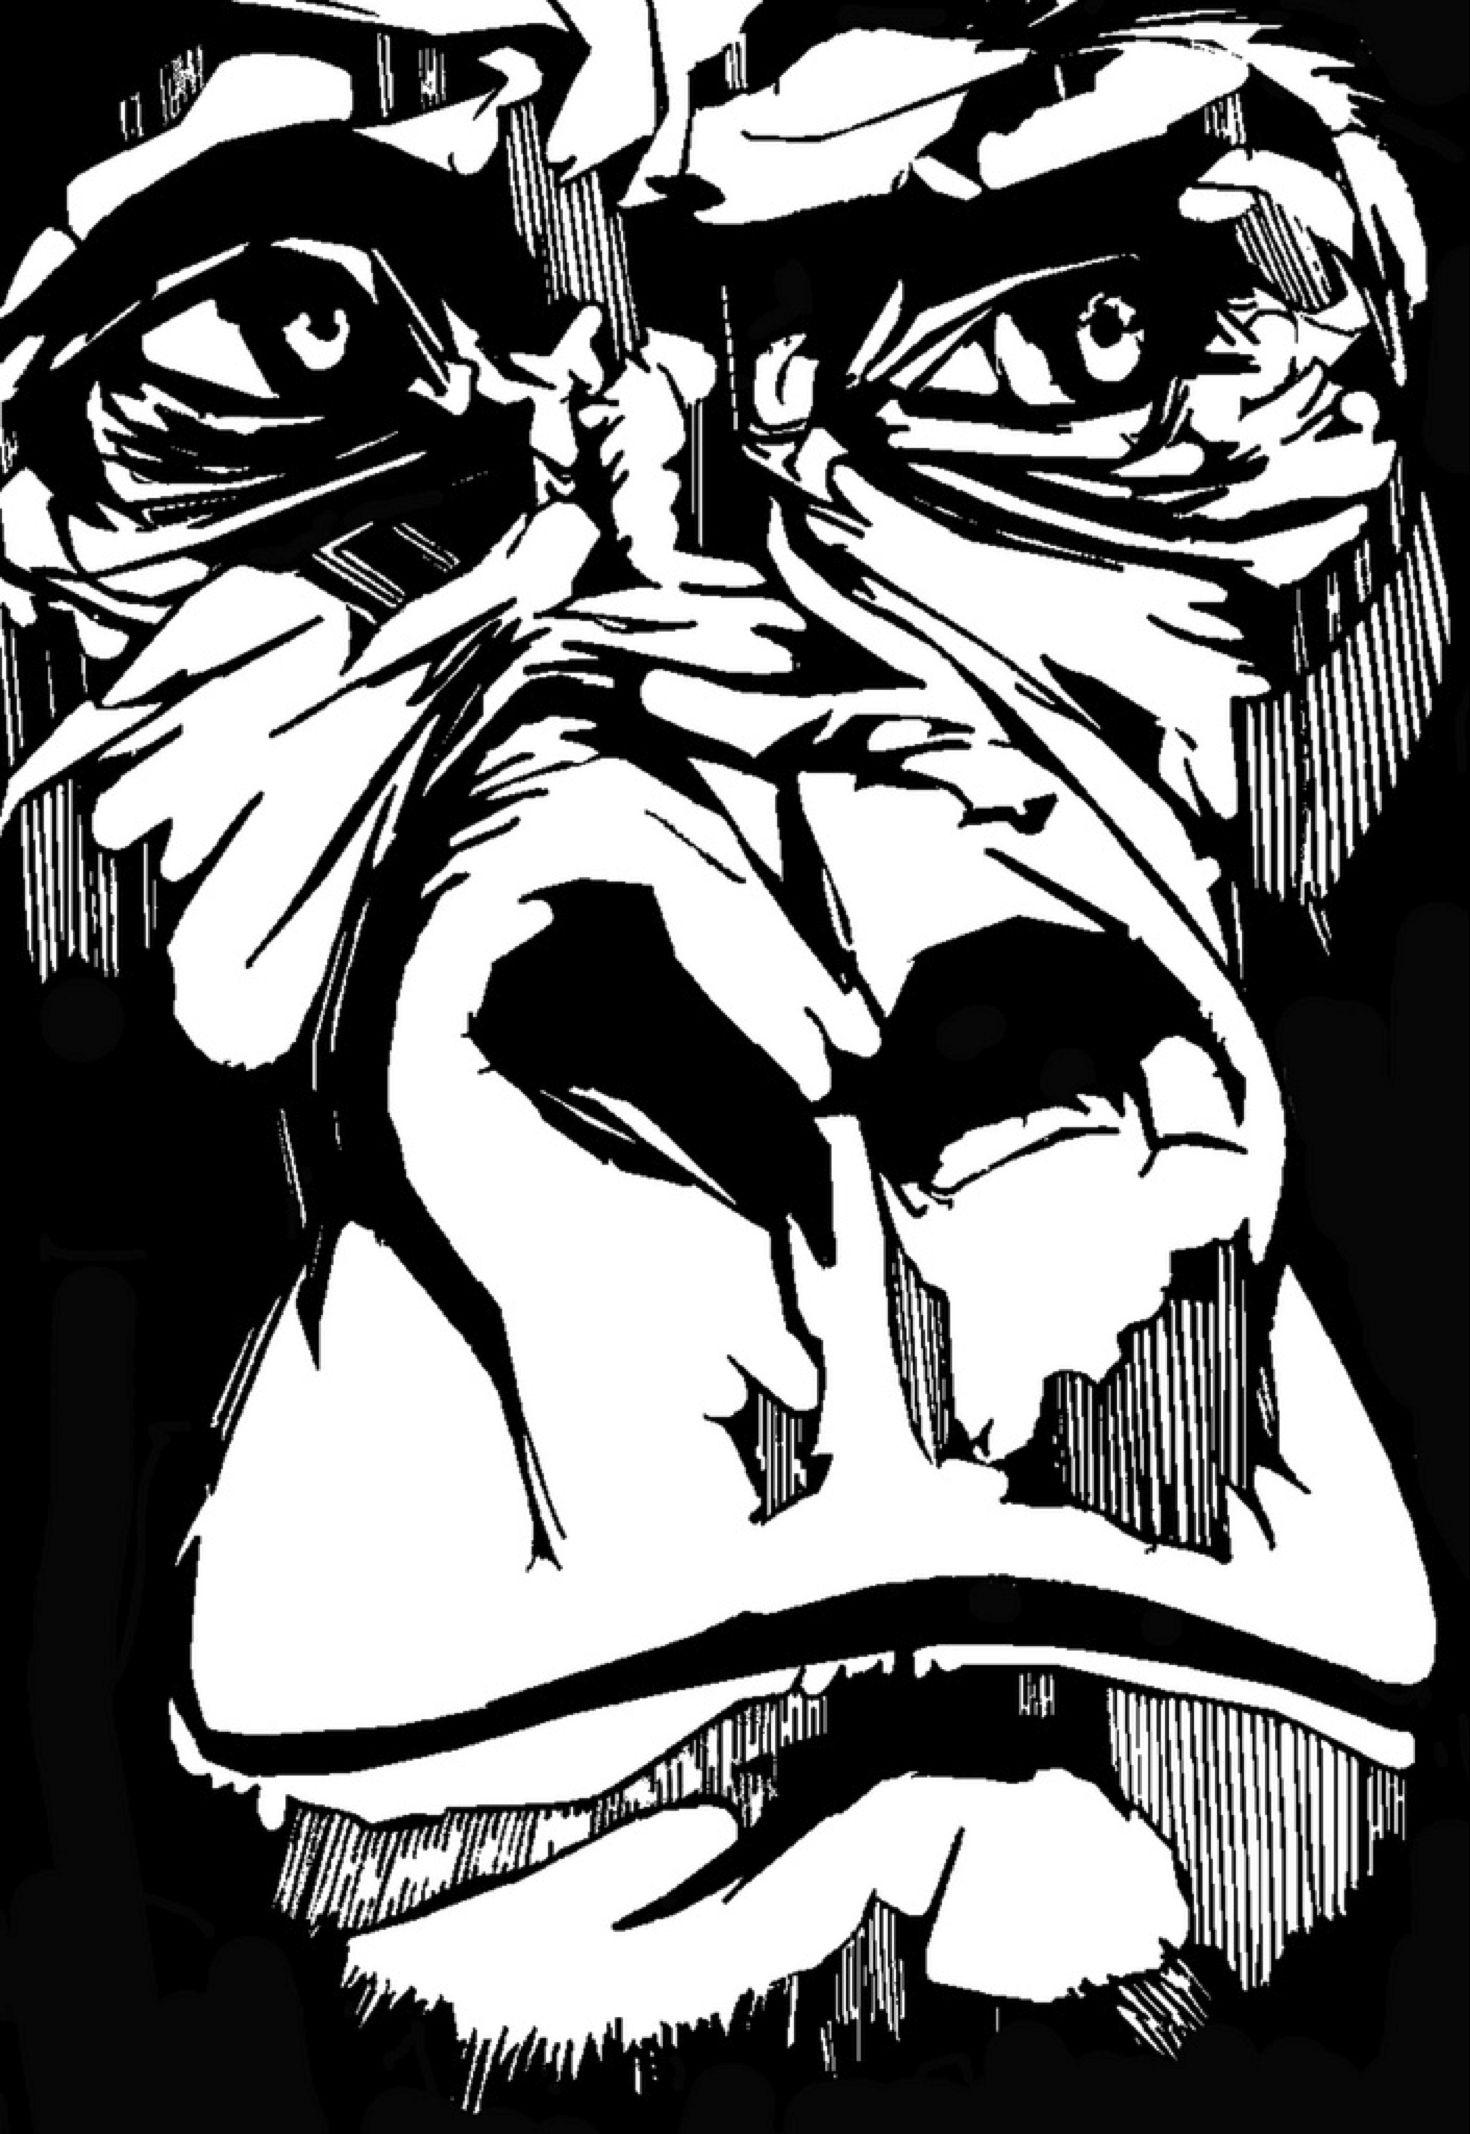 gorilla face stencil monkey needs to get ripped can you8230 Pogo Monkey GTA gorilla face stencil monkey needs to get ripped can you8230 1470x2134 wallpaper art hd wallpaper